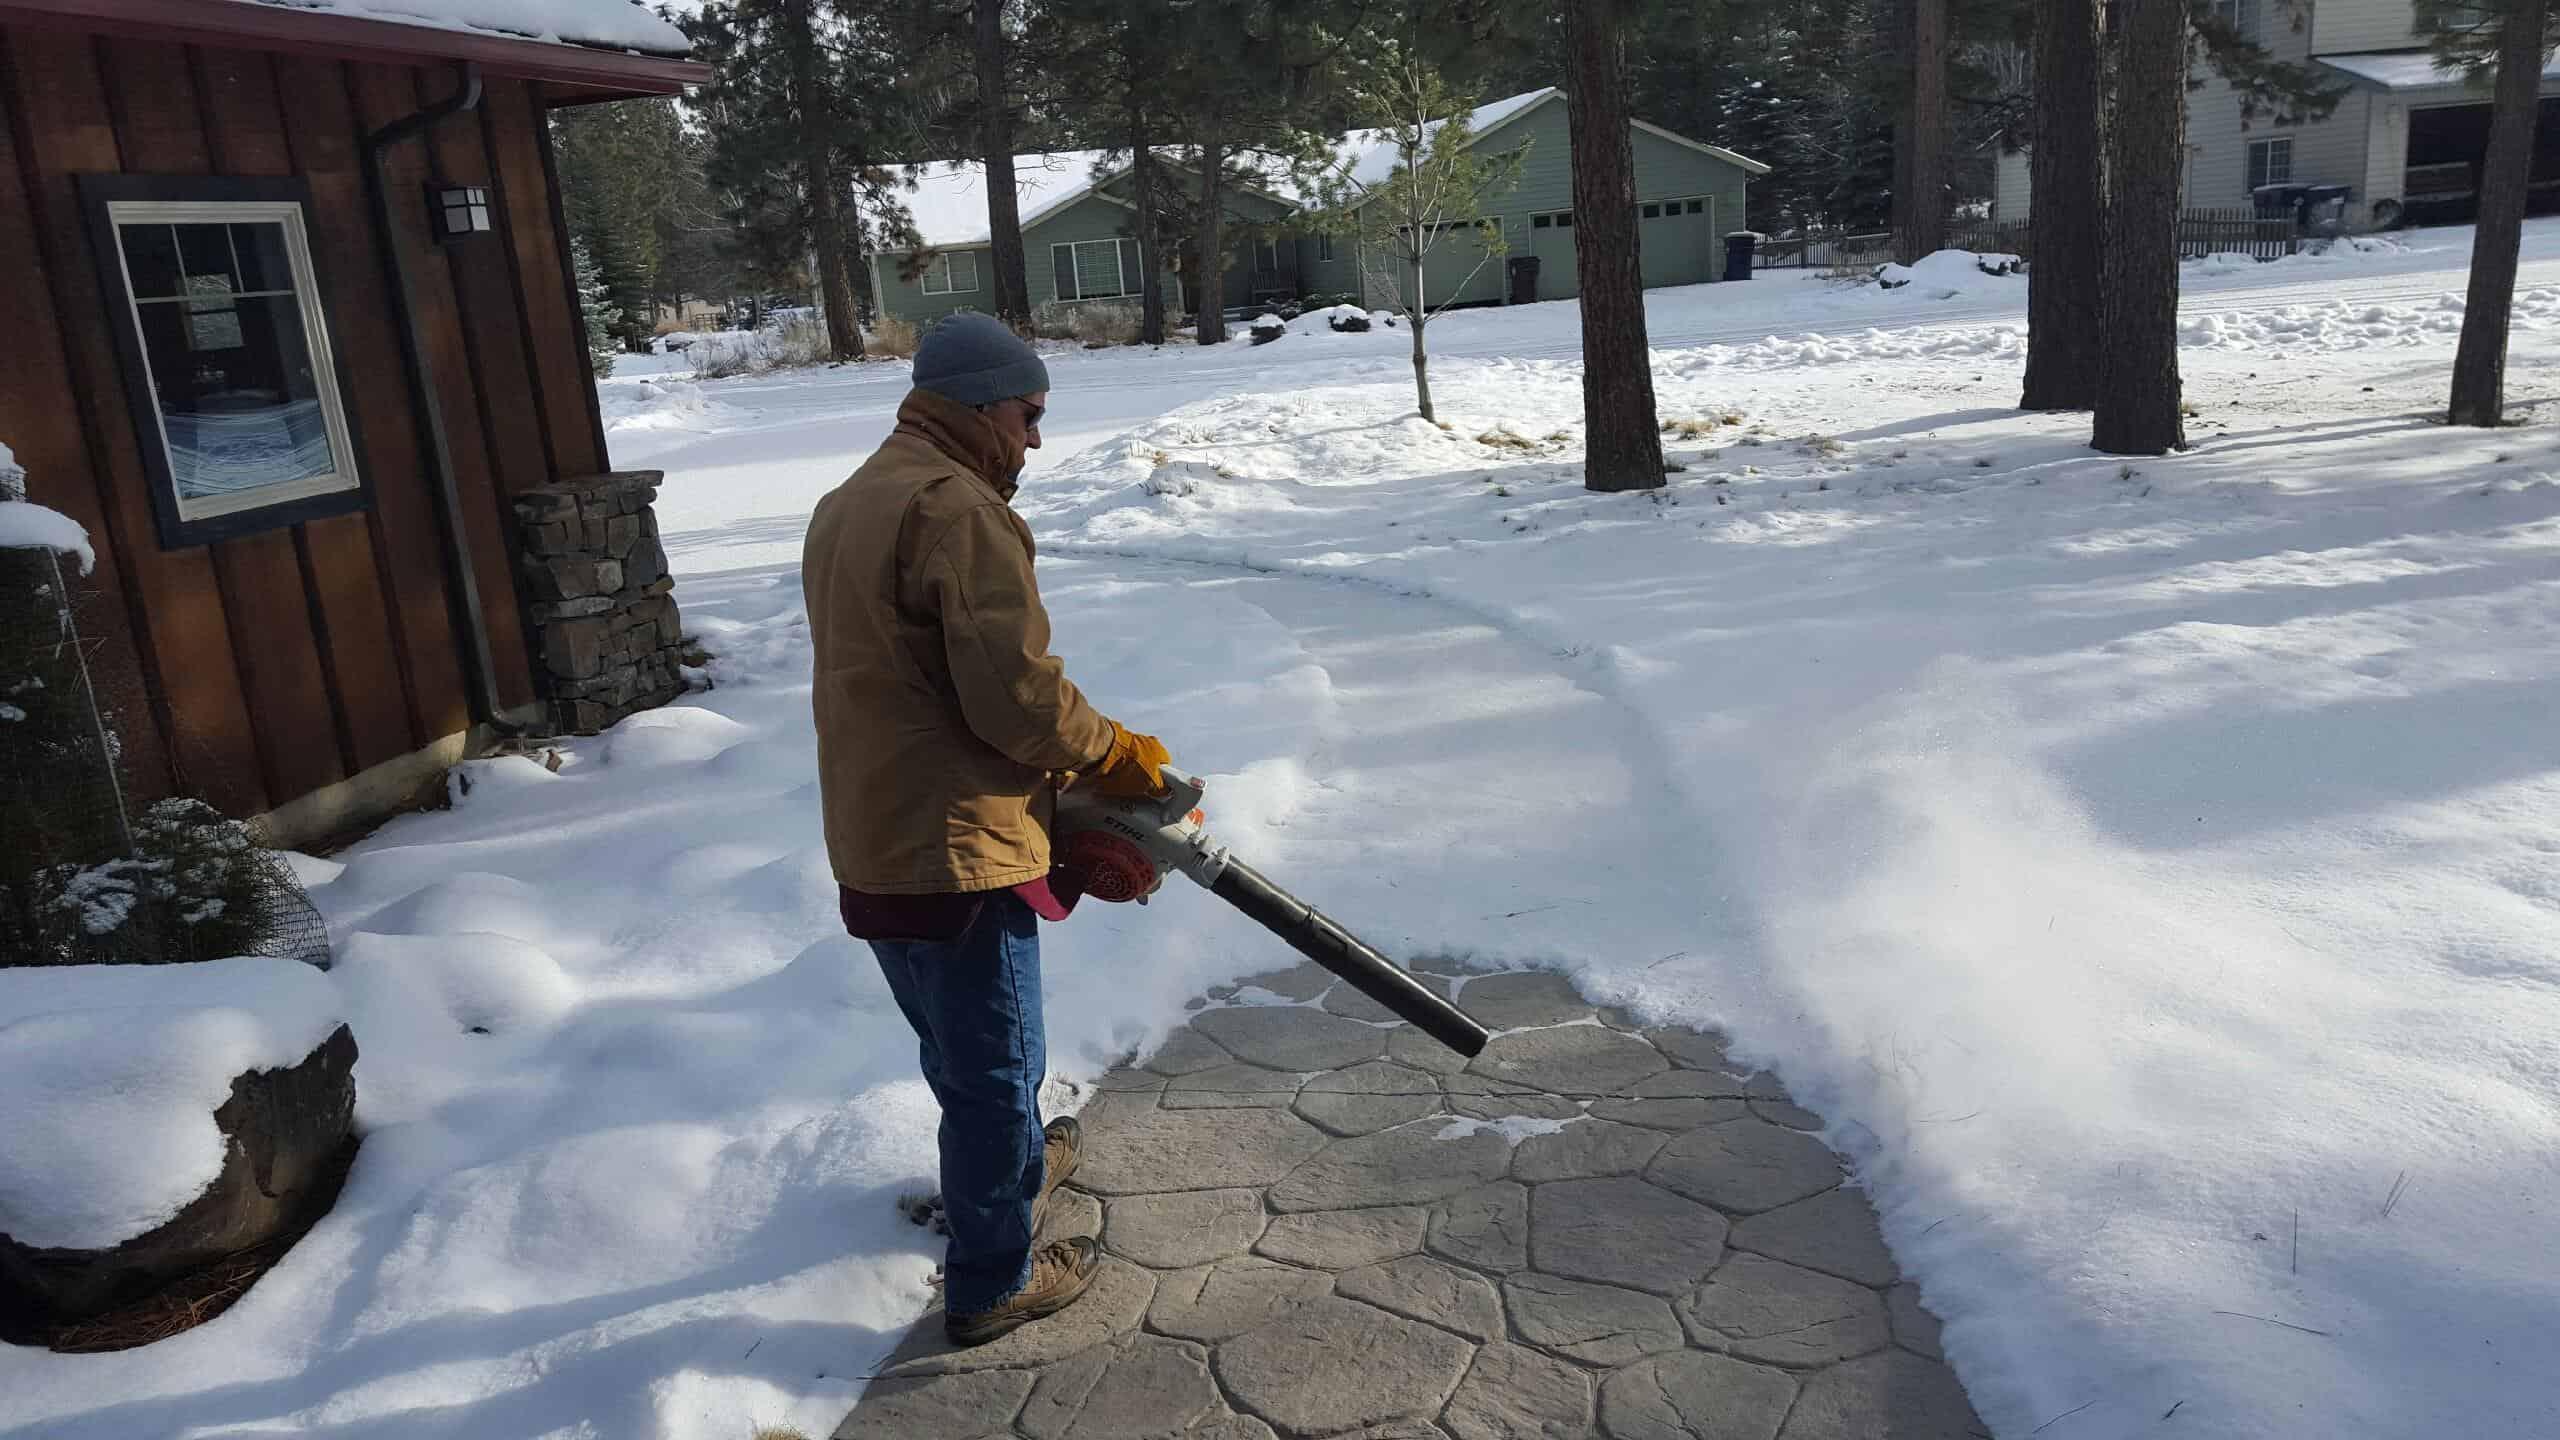 Blowing Snow | www.johnkreft.com